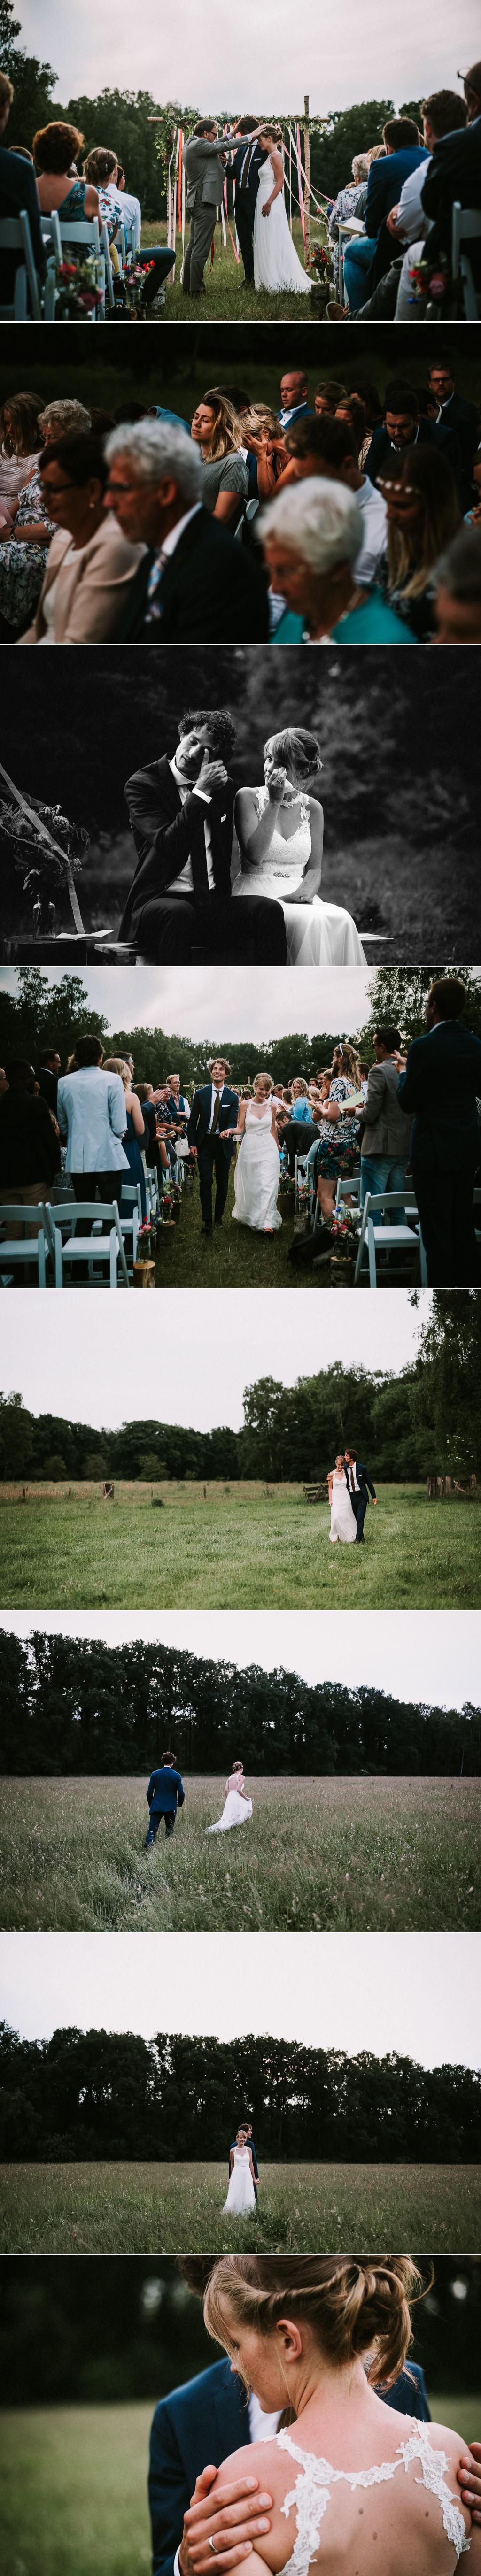 trouwfotograaf-rotterdam-trouwen-in-het-bos-arnhem-fotografie-steef-utama-w-w-12